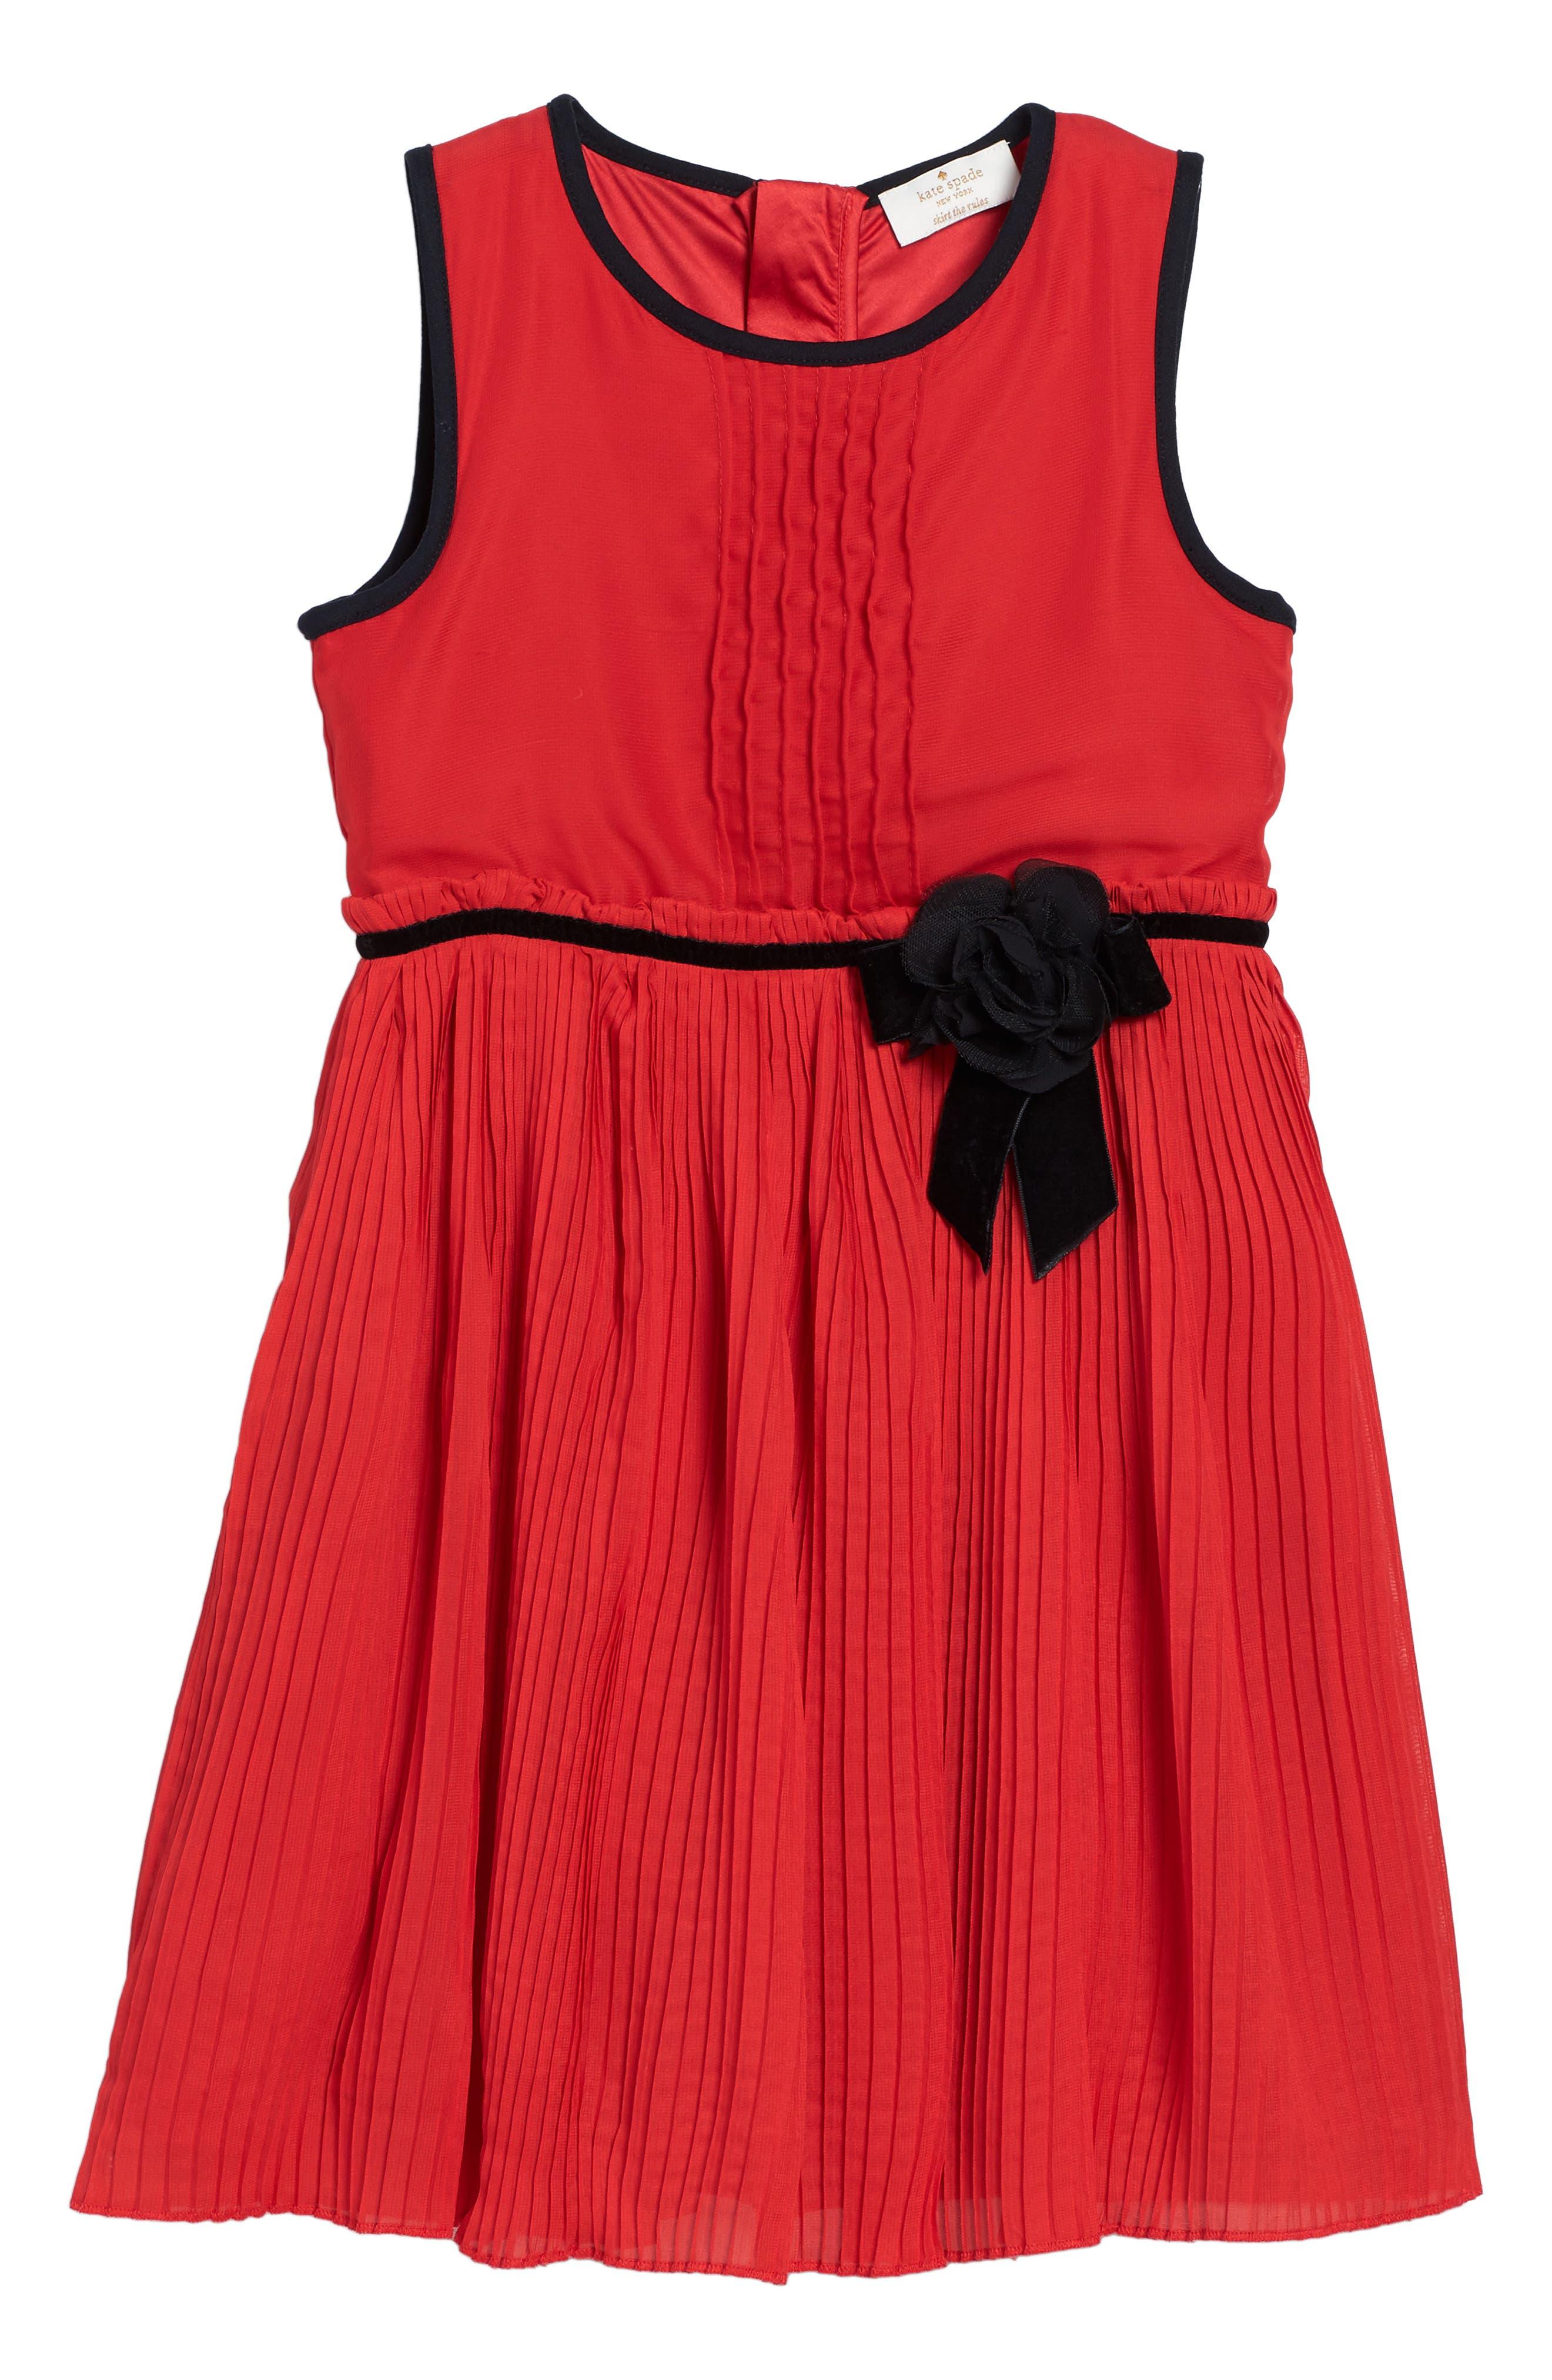 Alternate Image 1 Selected - kate spade new york pleated chiffon party dress (Big Girls)